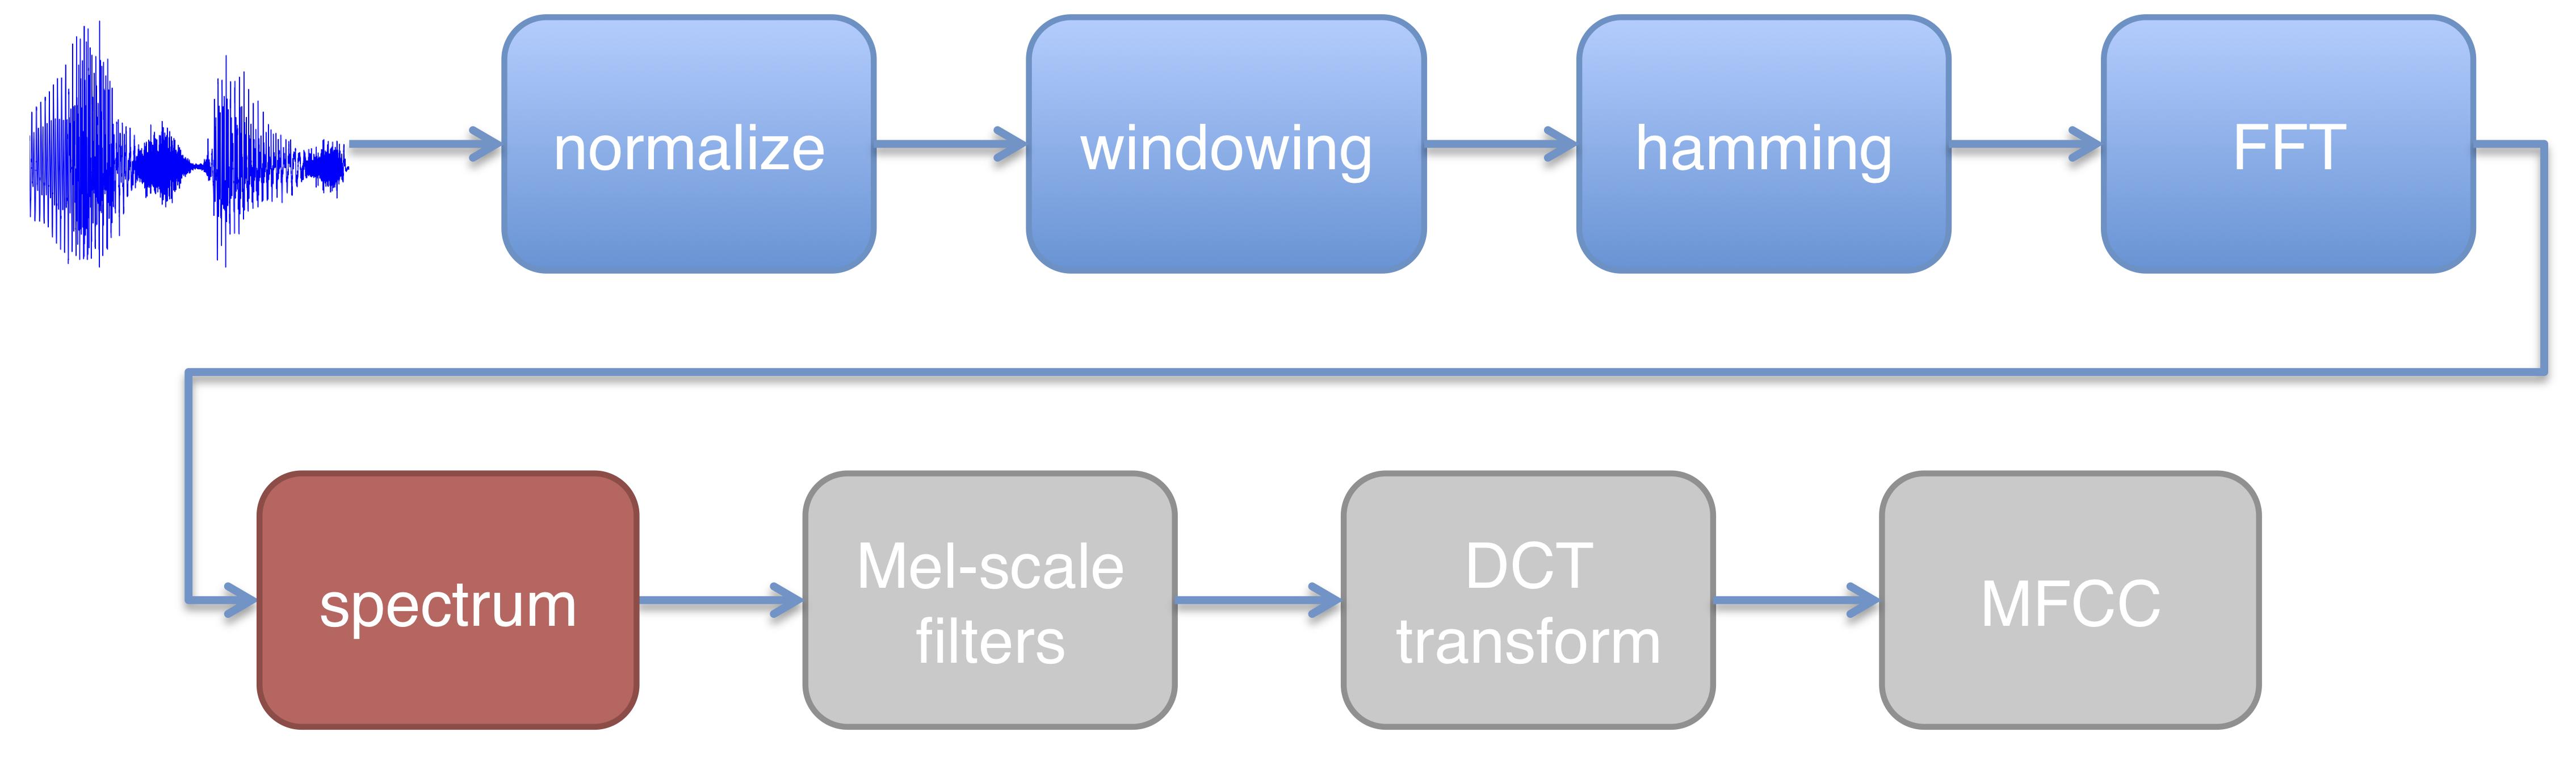 notebooks/figures/spectrum-diagram.png